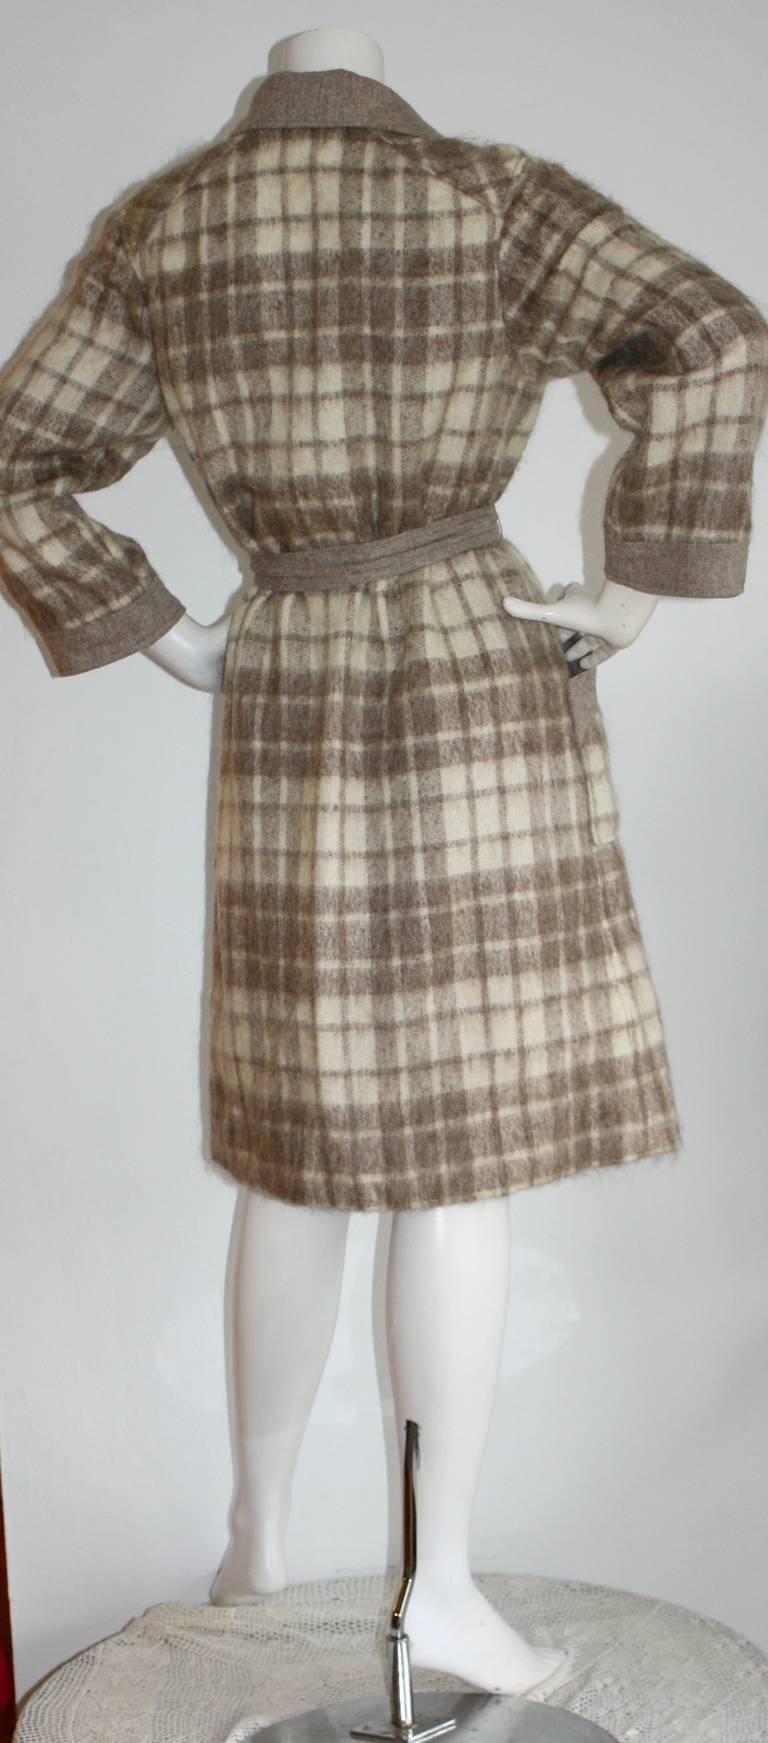 Vintage Pierre Cardin Heathered Camel Tartan Plaid Belted Wool Coat 7